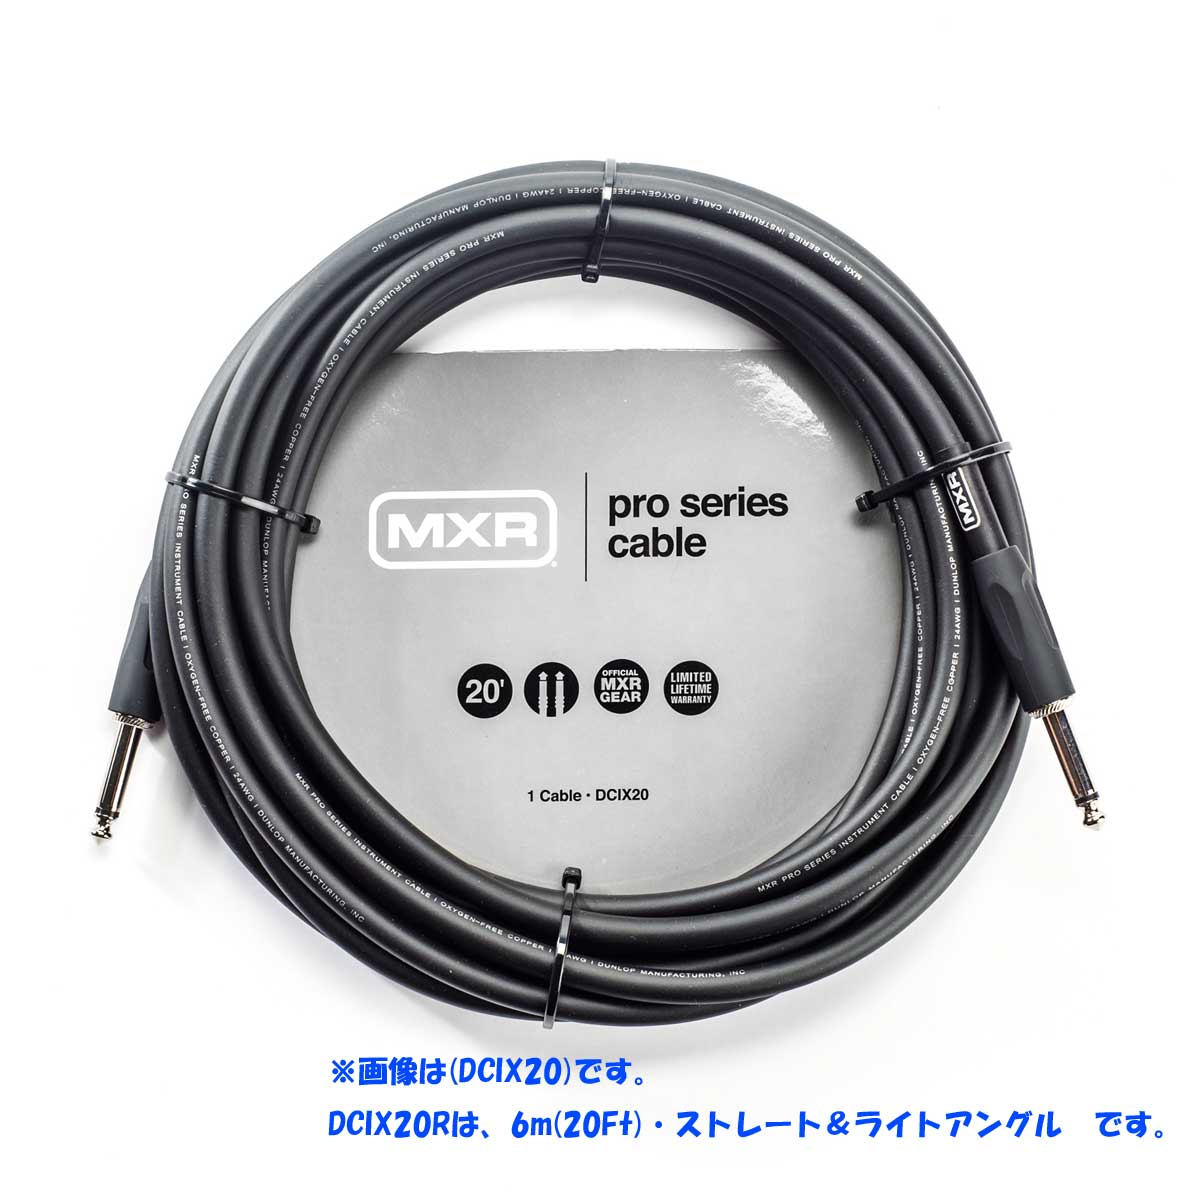 MXR エムエックスアール / DCIX20R 6m (20Ft) S/L ストレート&ライトアングル プロシリーズ シールドケーブル【お取り寄せ商品】